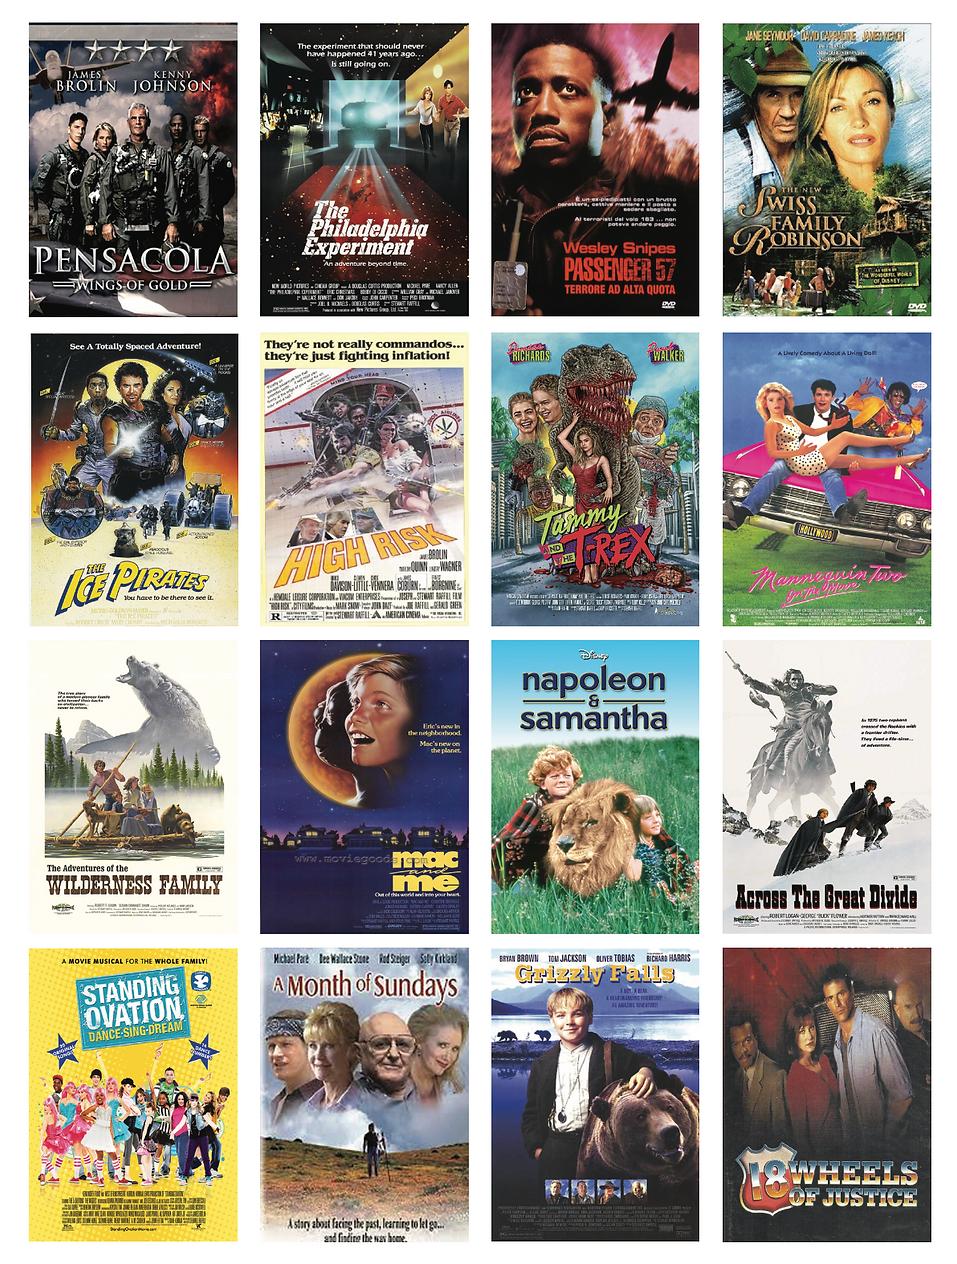 Stewart Raffill Film and TV Highlights